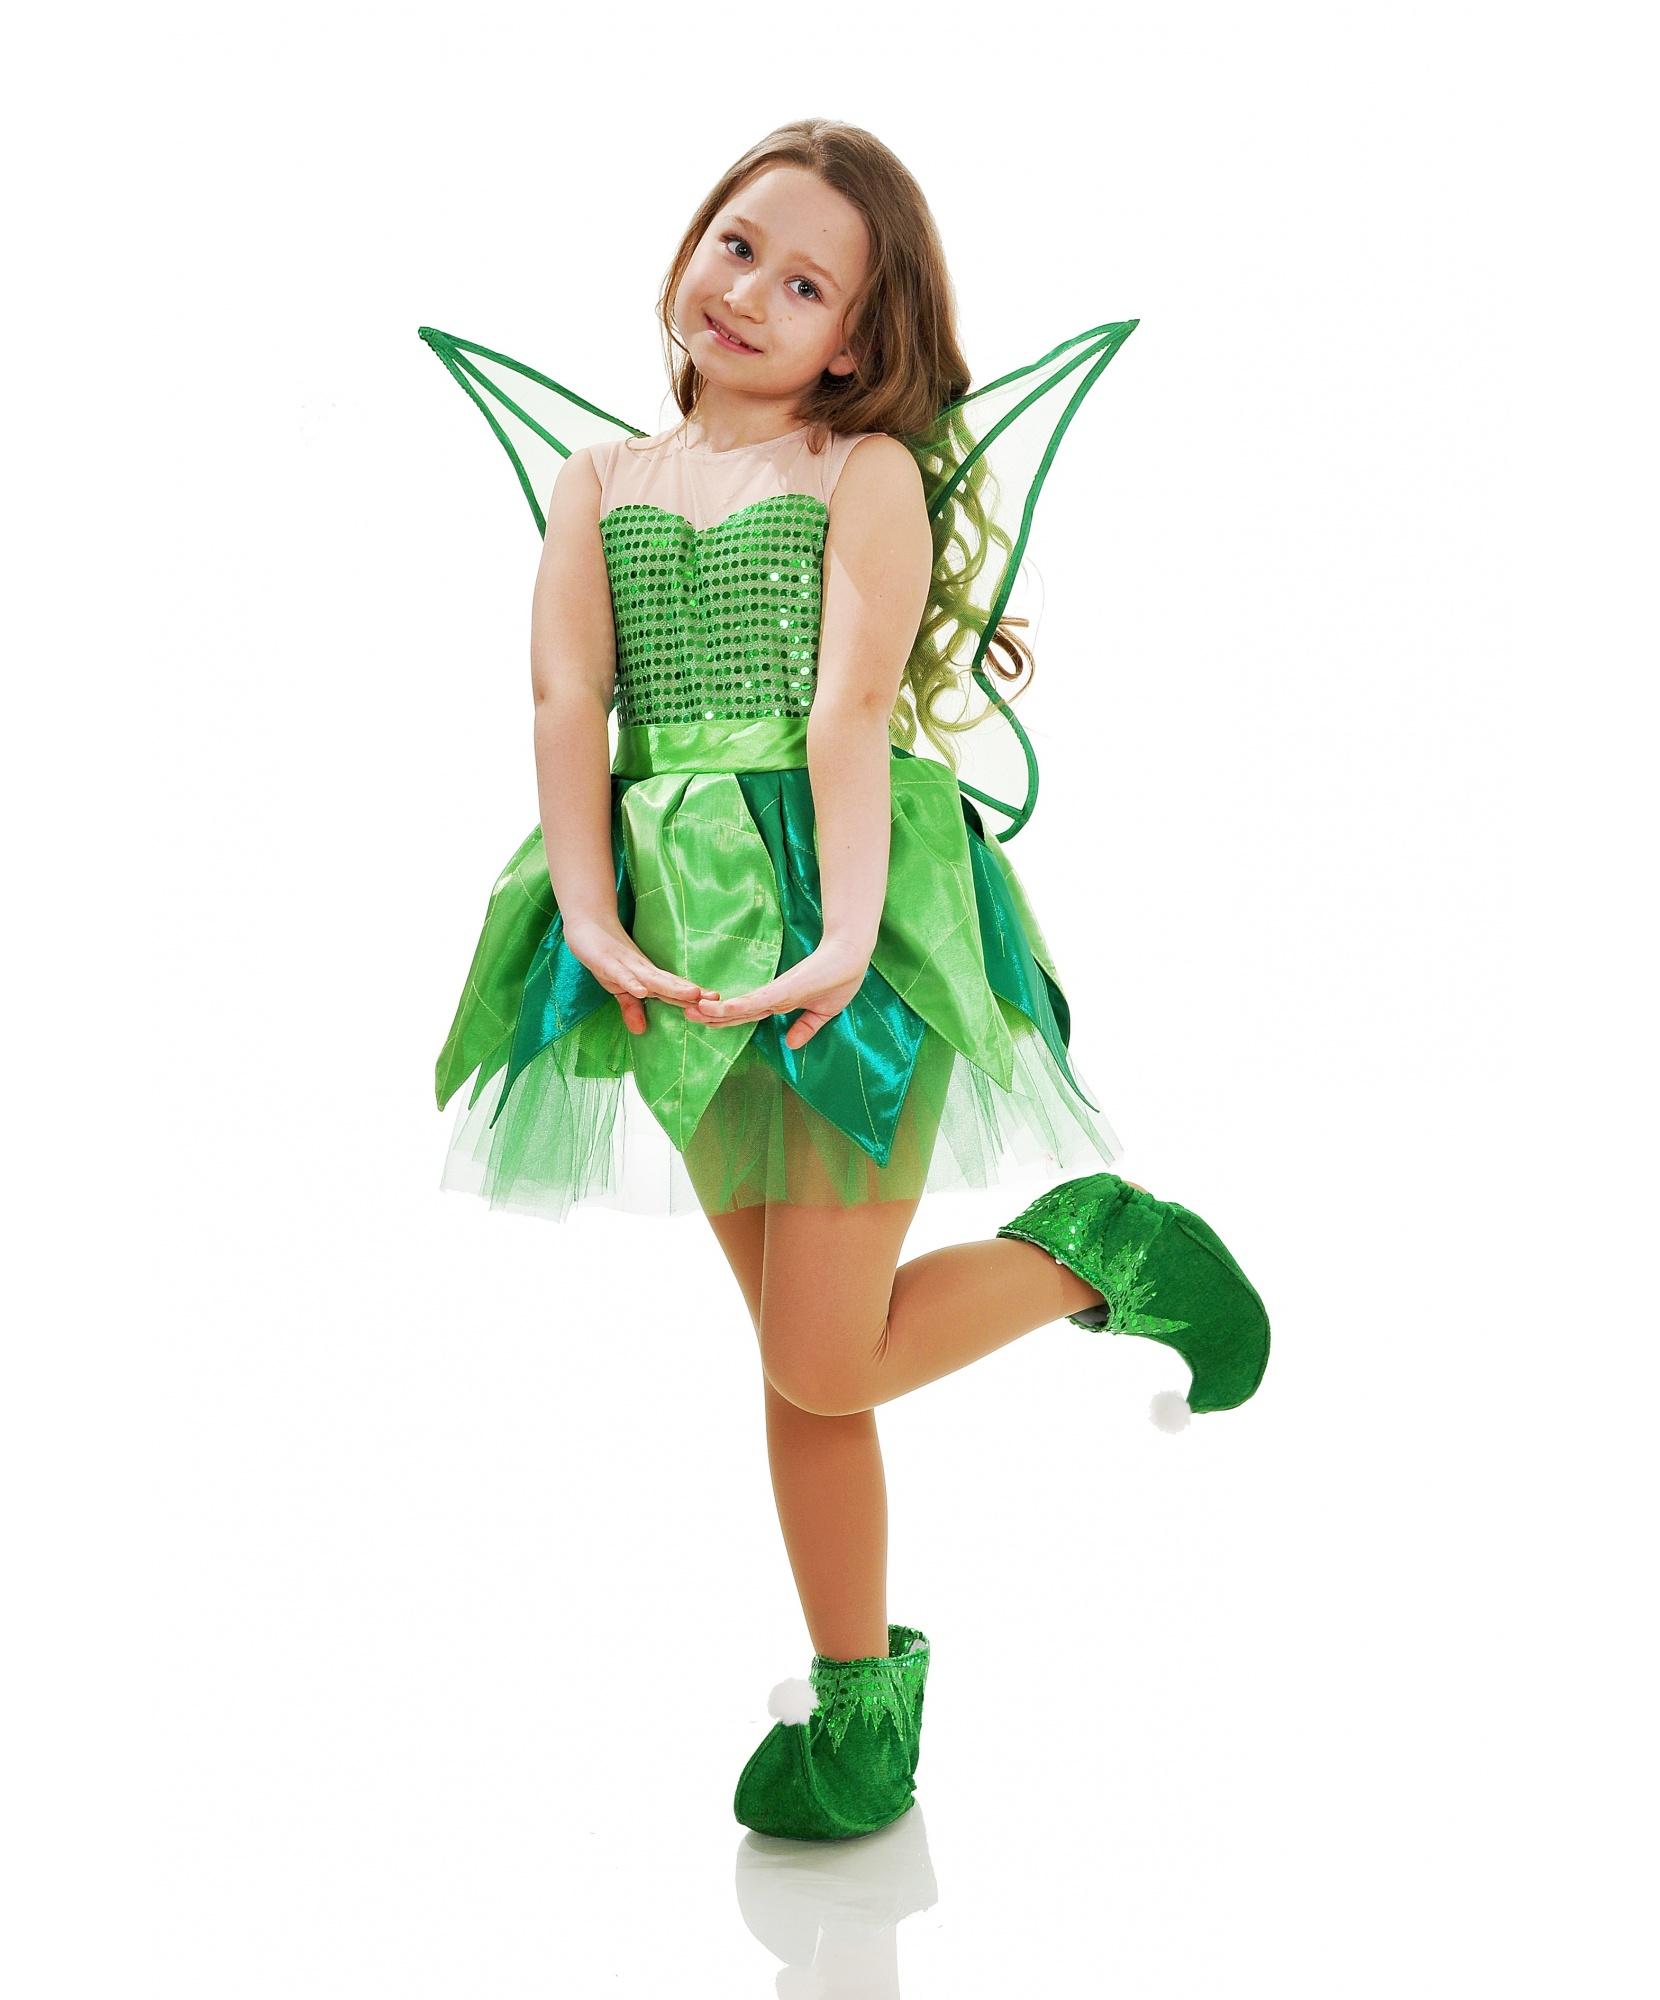 32fb7e74ce28a3 Костюм феи : платье с крылышками, имитация обуви (Украина)